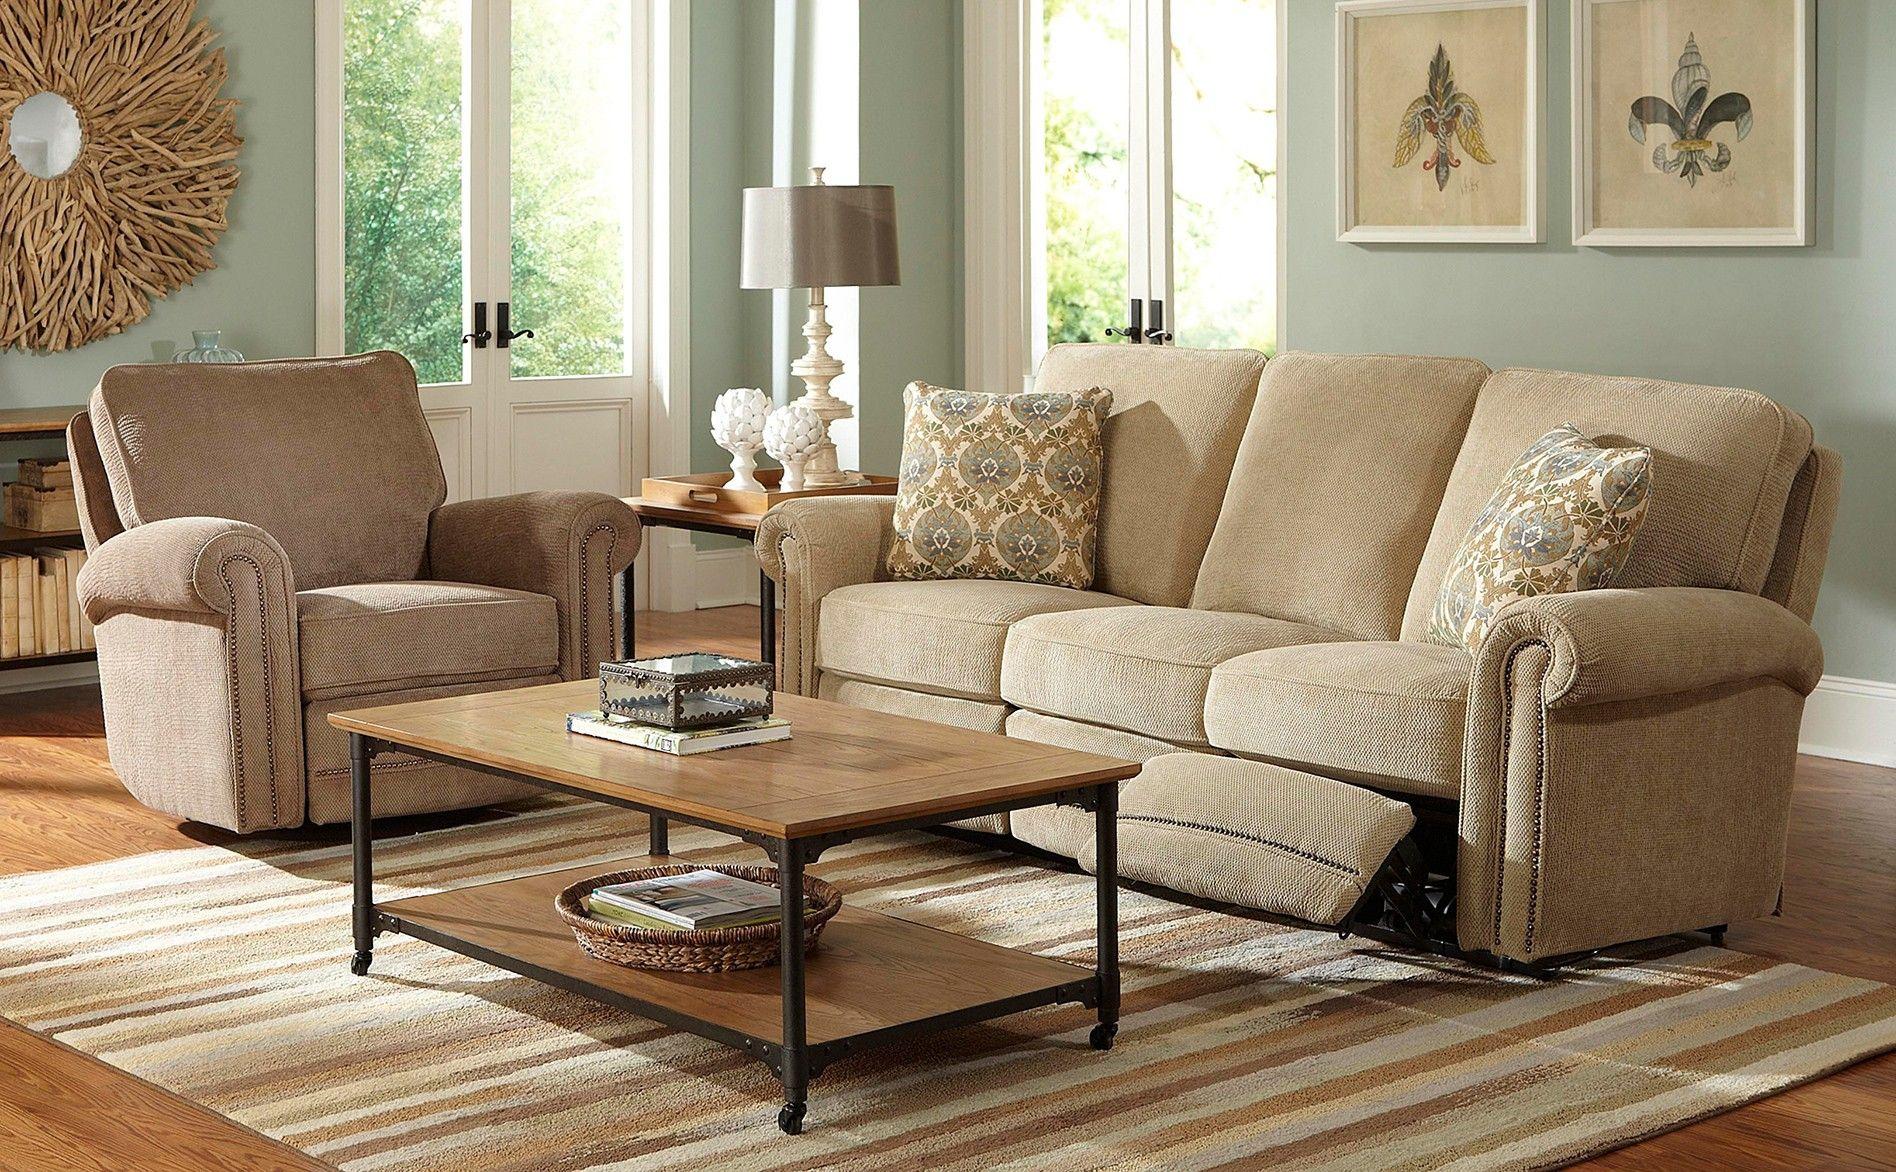 Broyhill Jasmine Double Reclining Sofa Beautiful Rooms